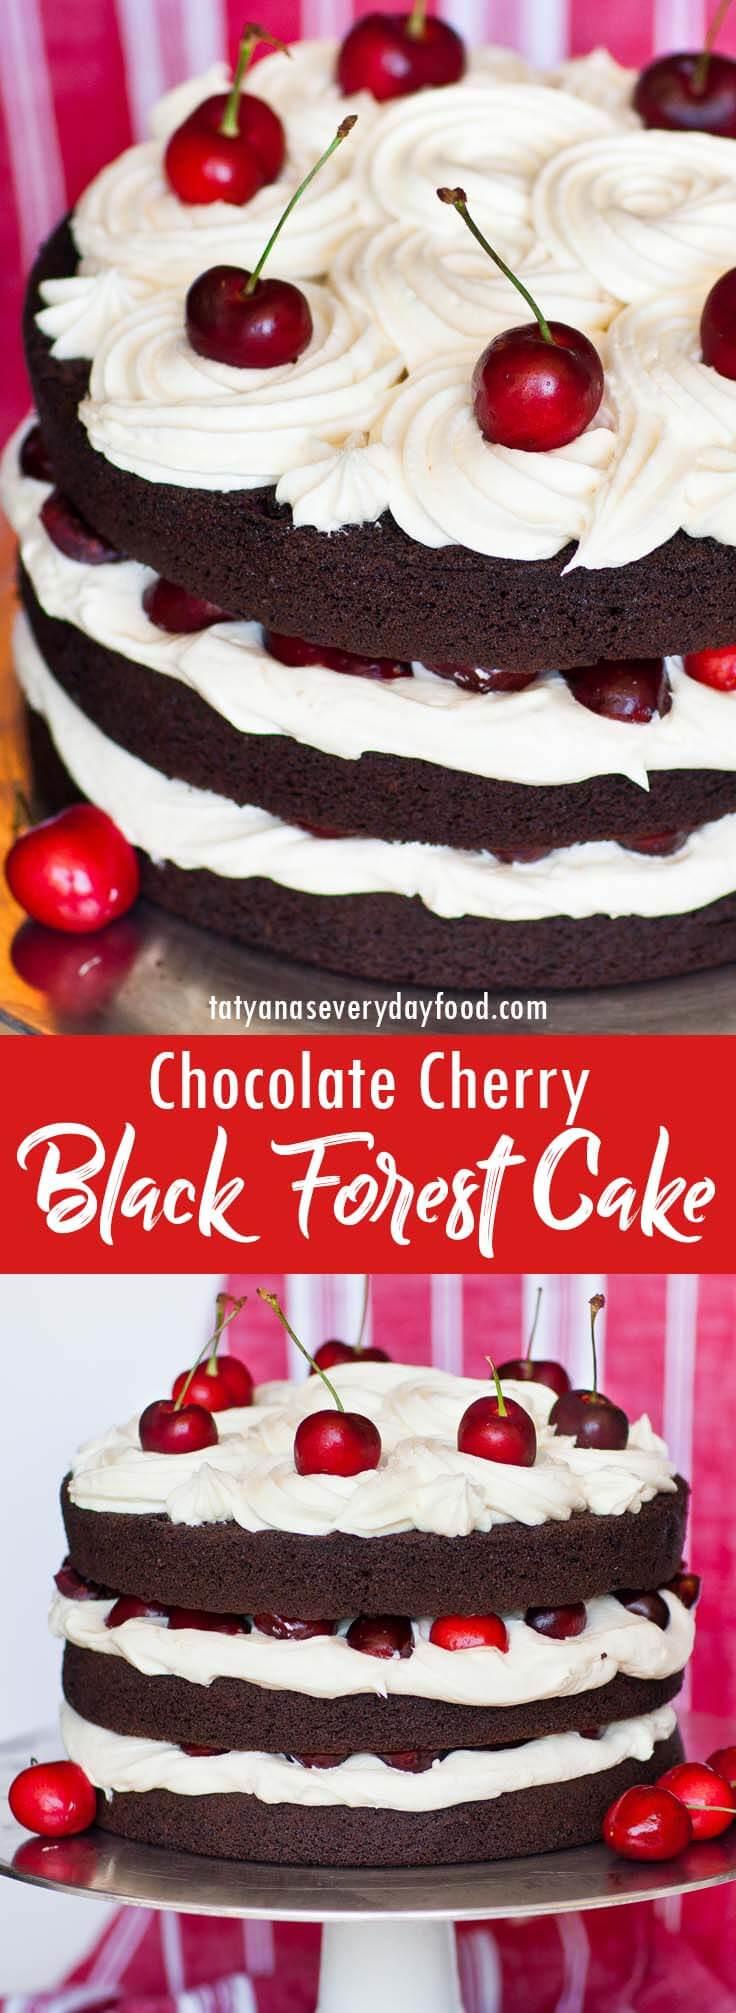 Black Forest Chocolate Cherry Cake video recipe